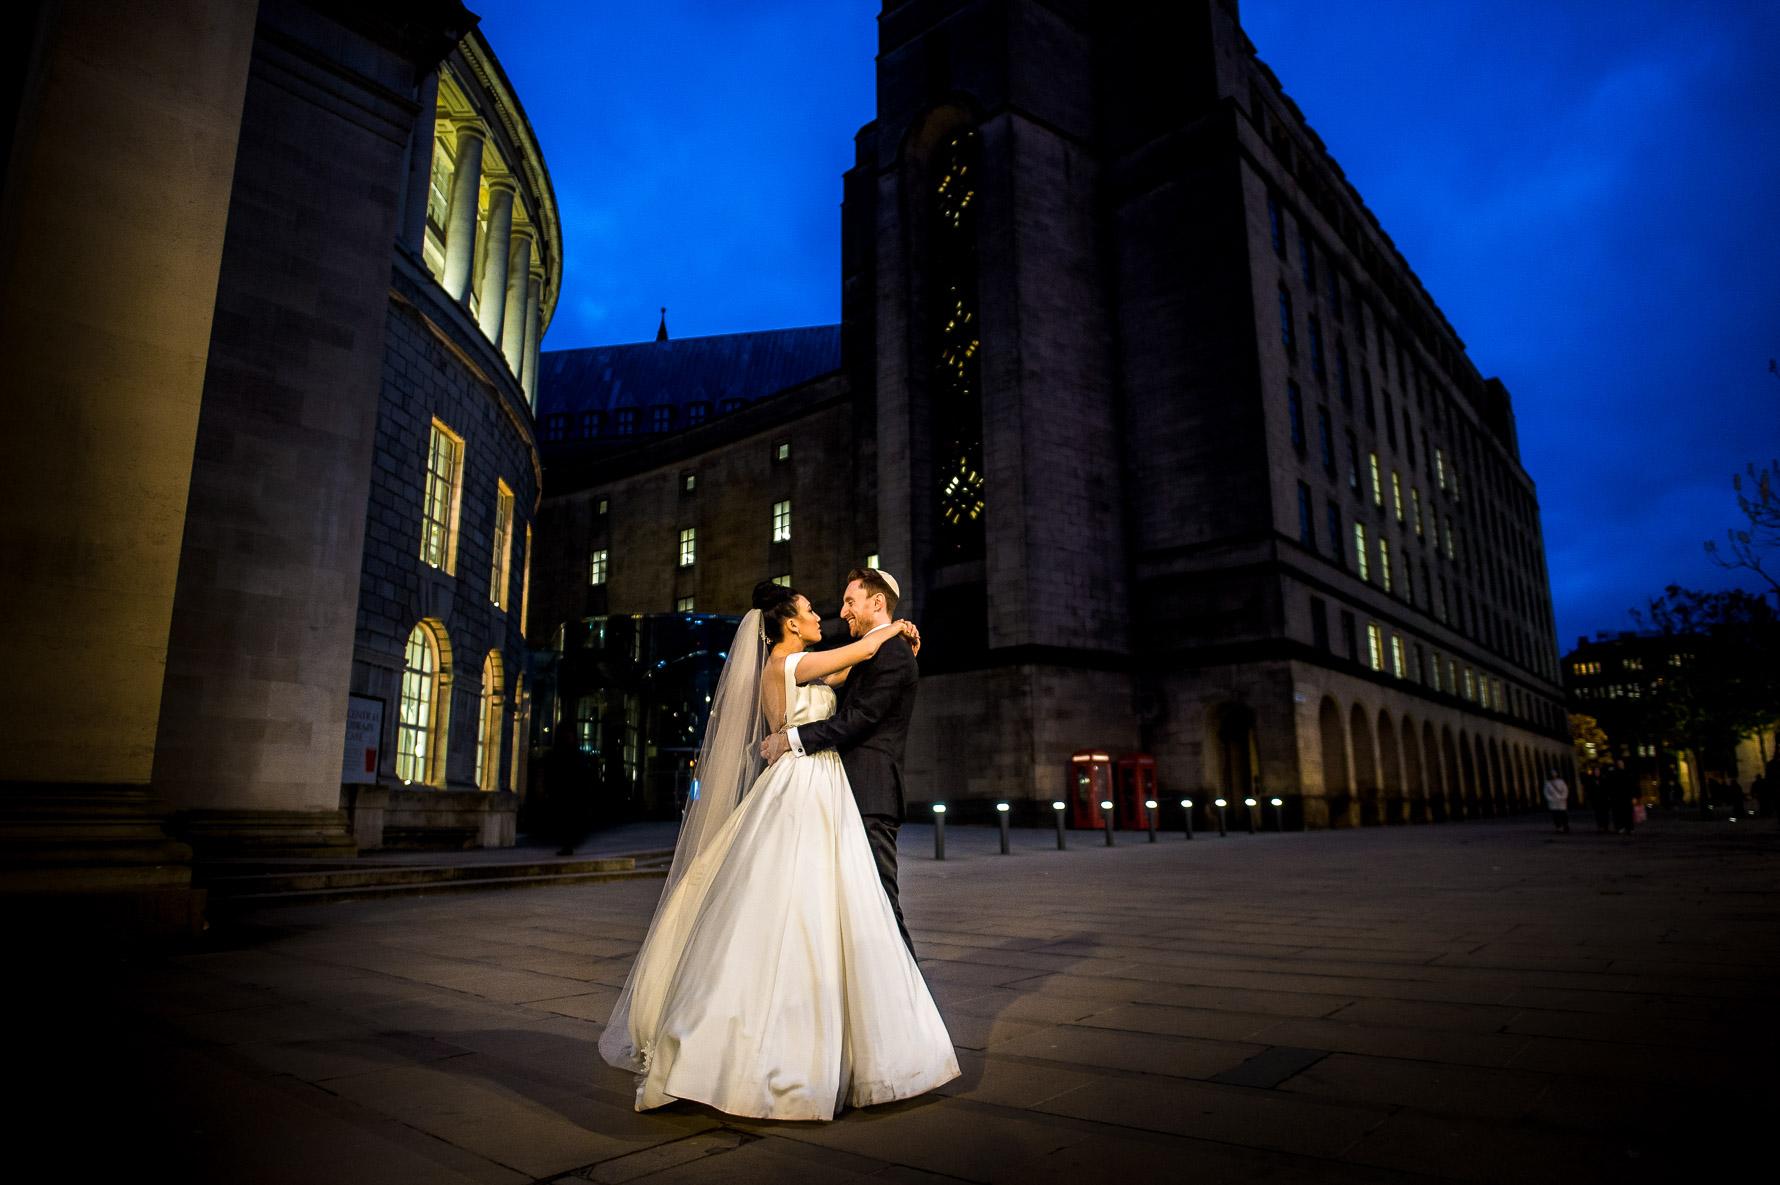 wedding photo in colour